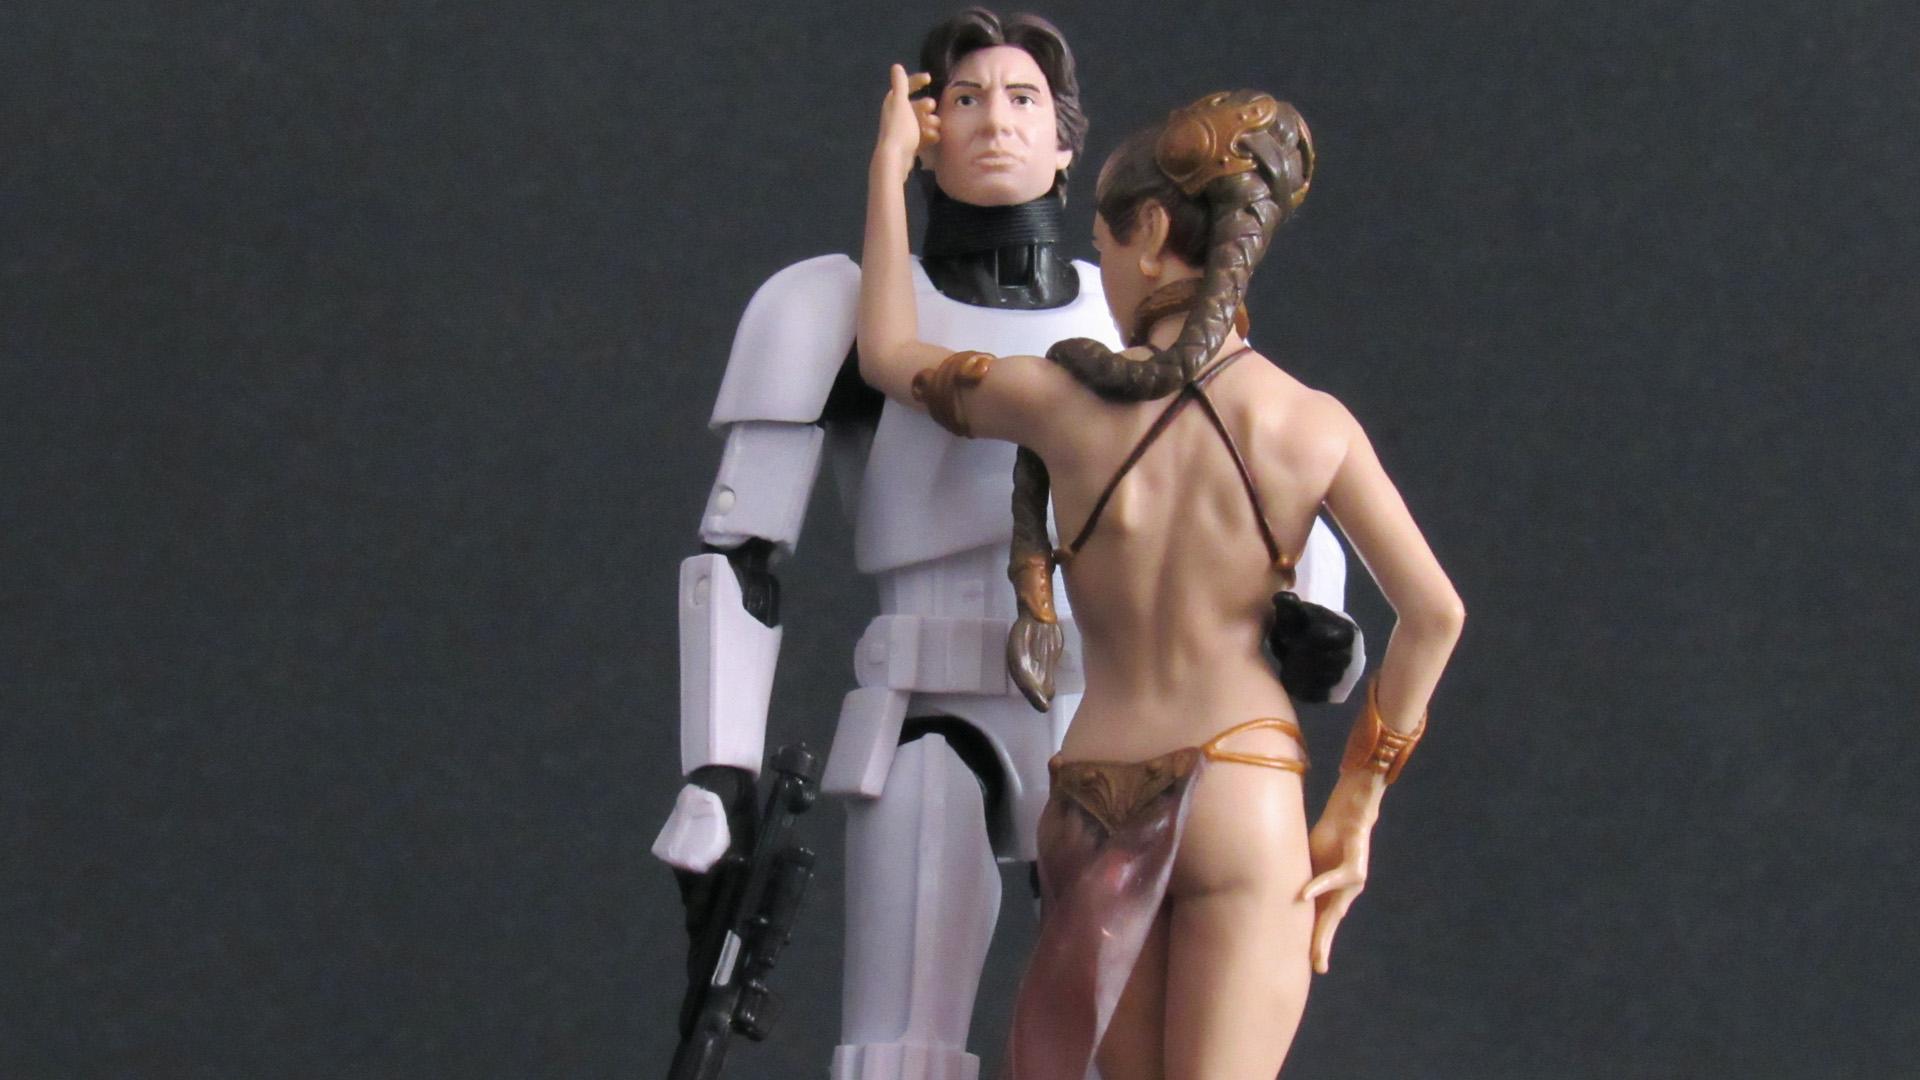 Hans et Leia.jpg